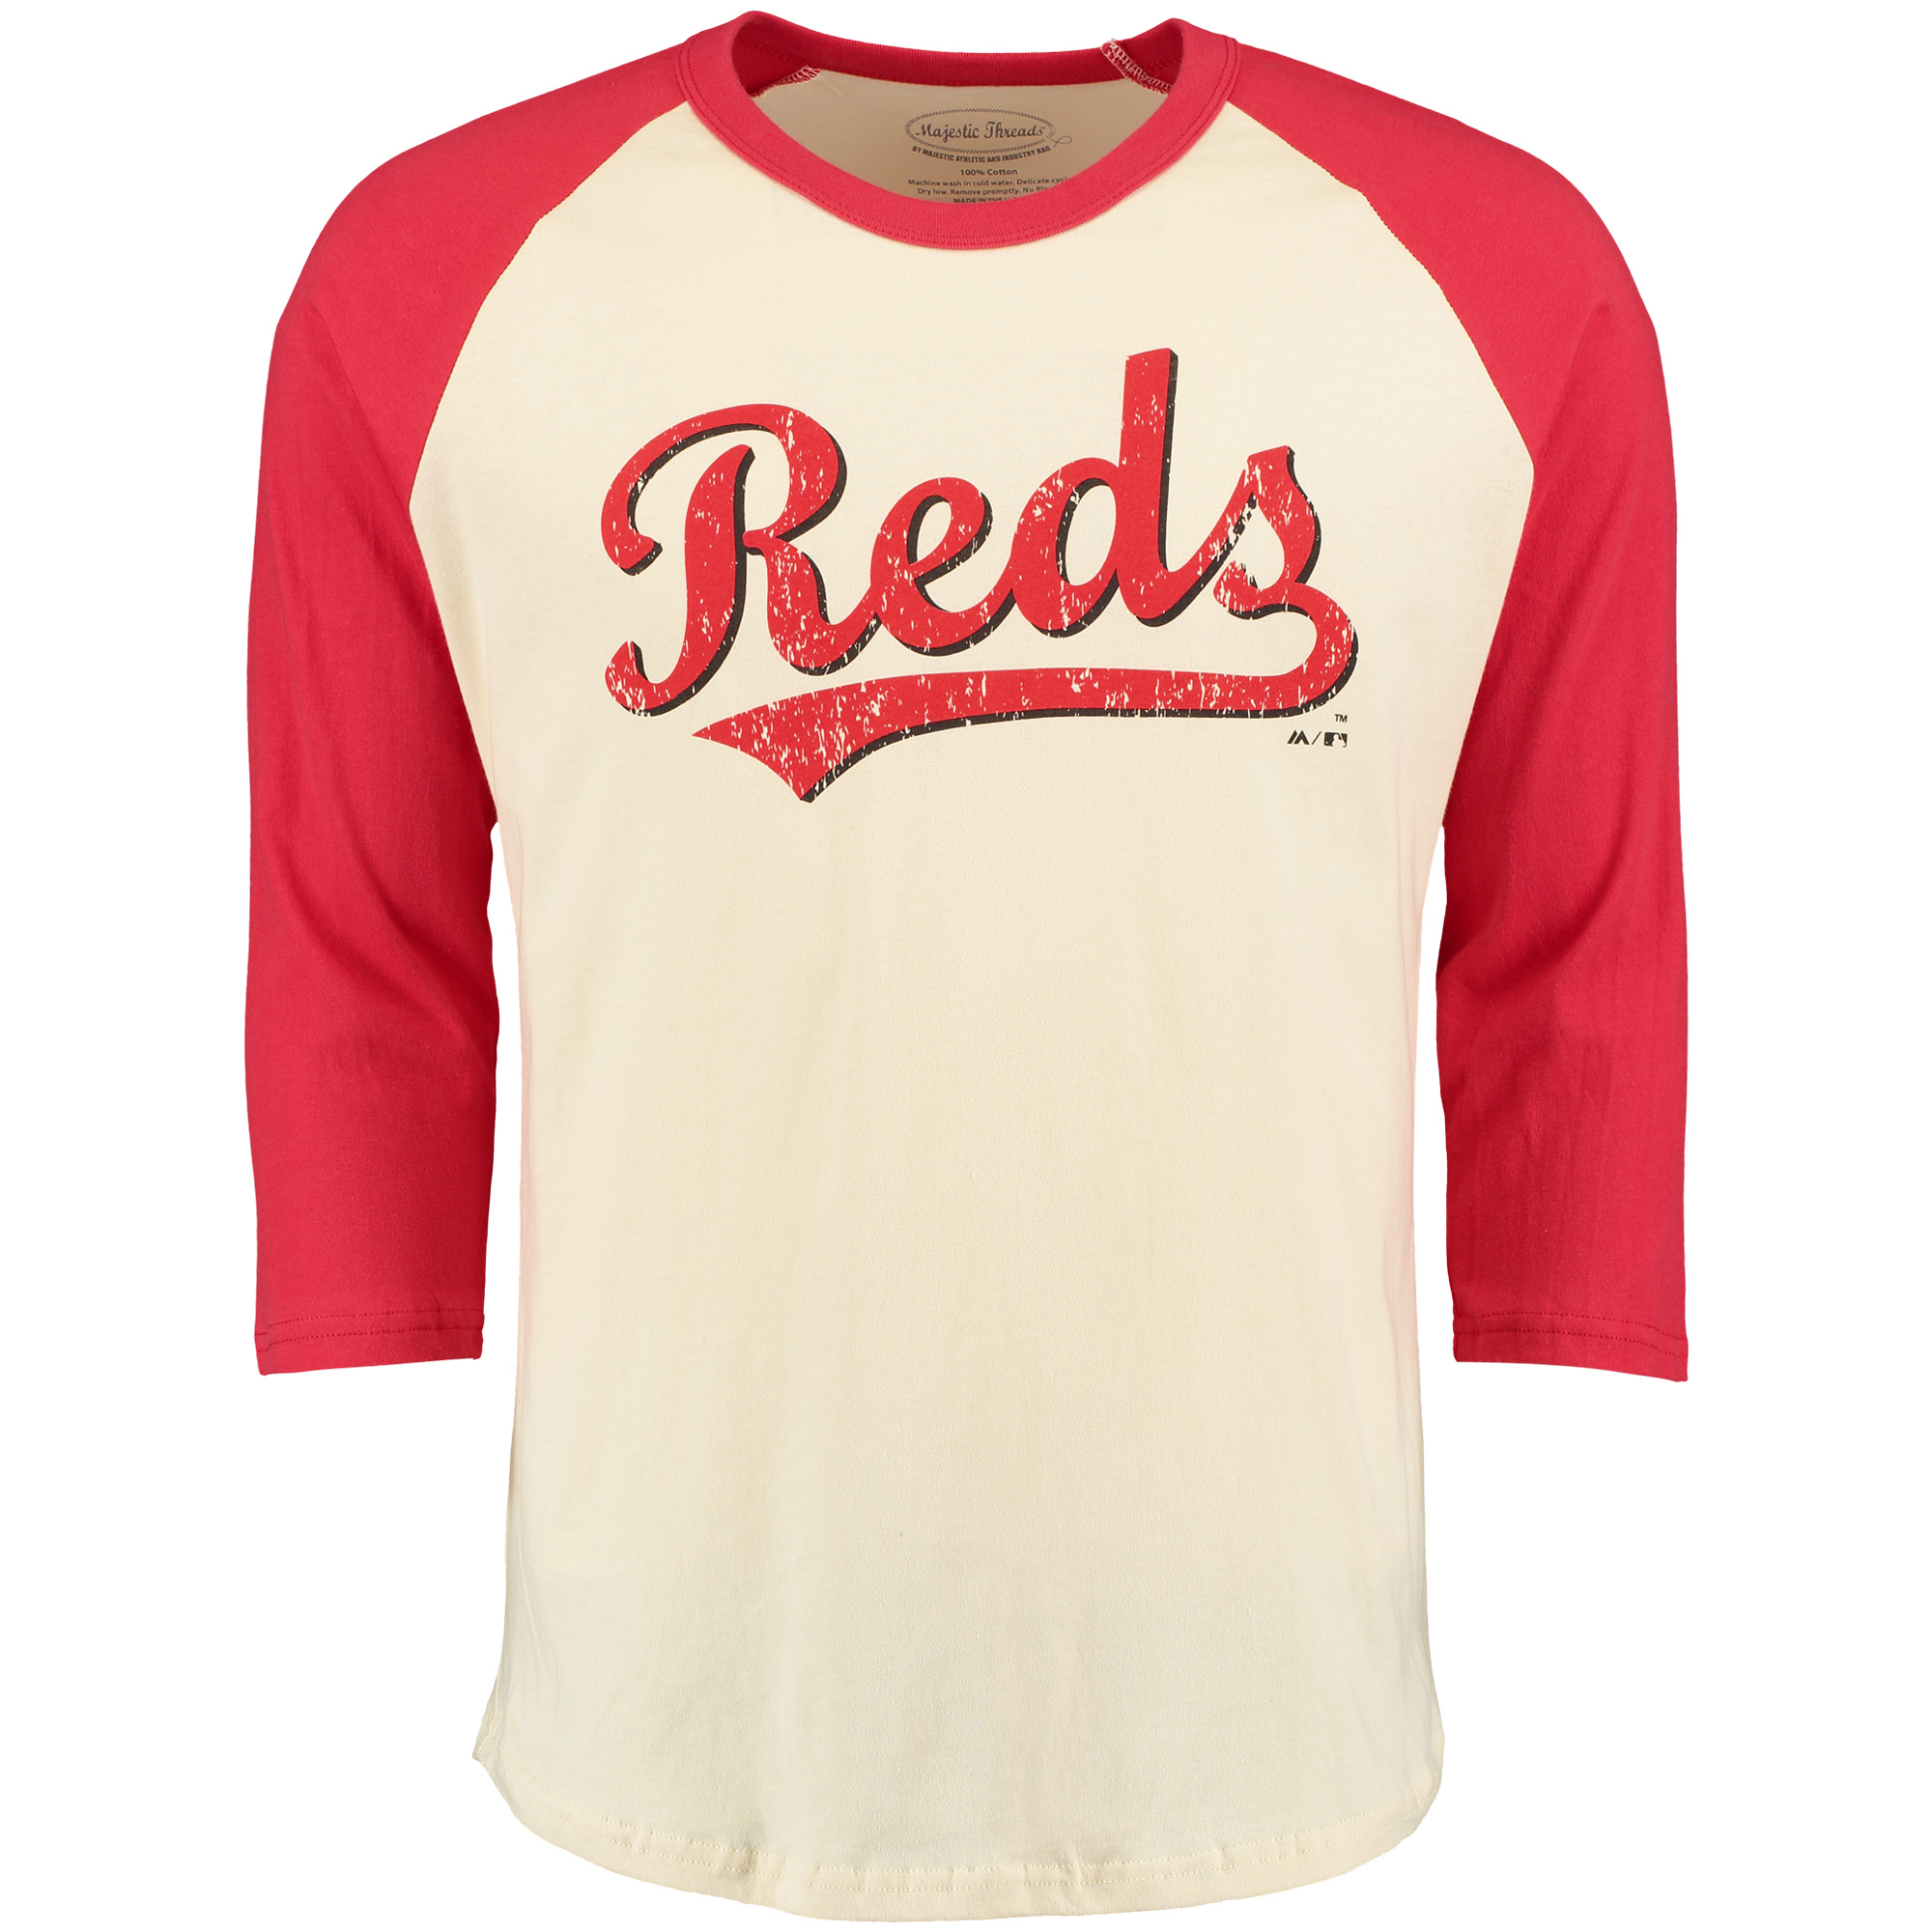 Cincinnati Reds Majestic Threads Softhand Vintage Cooperstown Three-Quarter Raglan Sleeve T-Shirt - Cream/Red